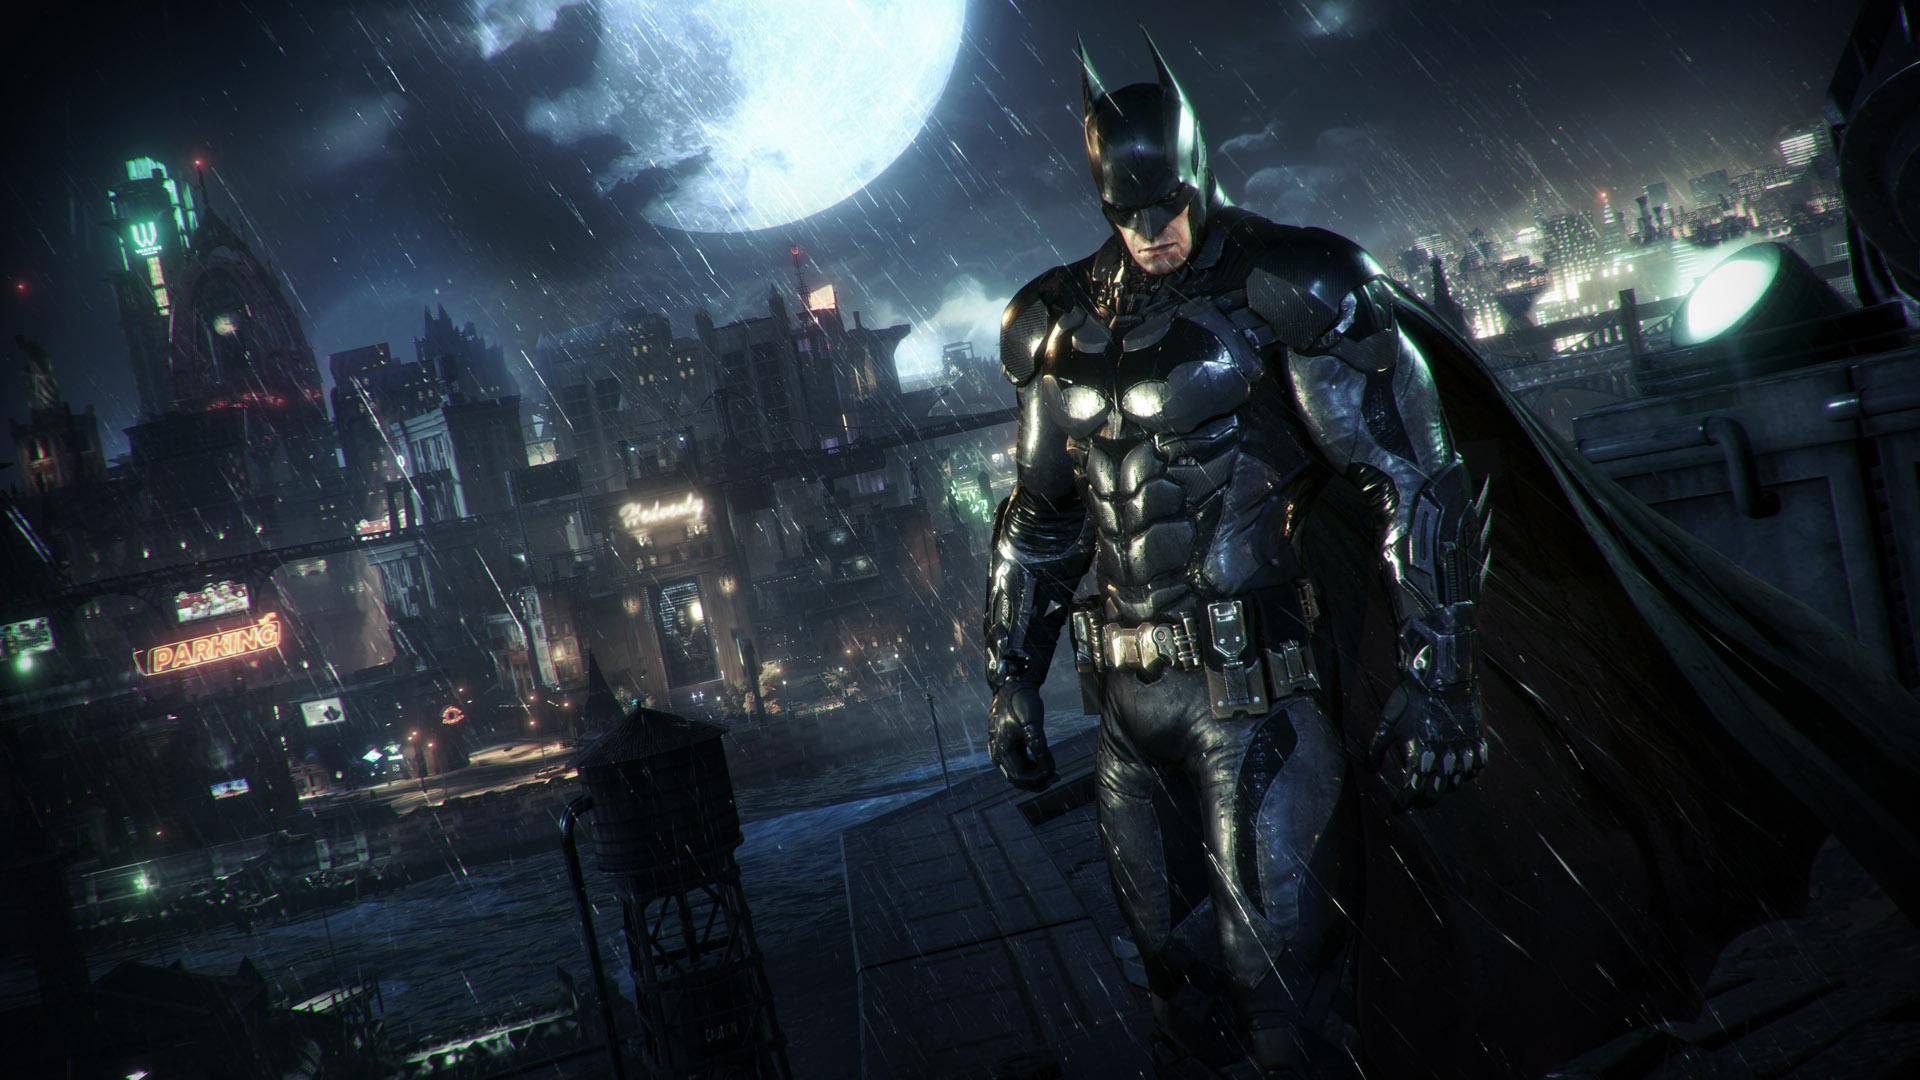 Nice Images Collection: Batman: Arkham Knight Desktop Wallpapers